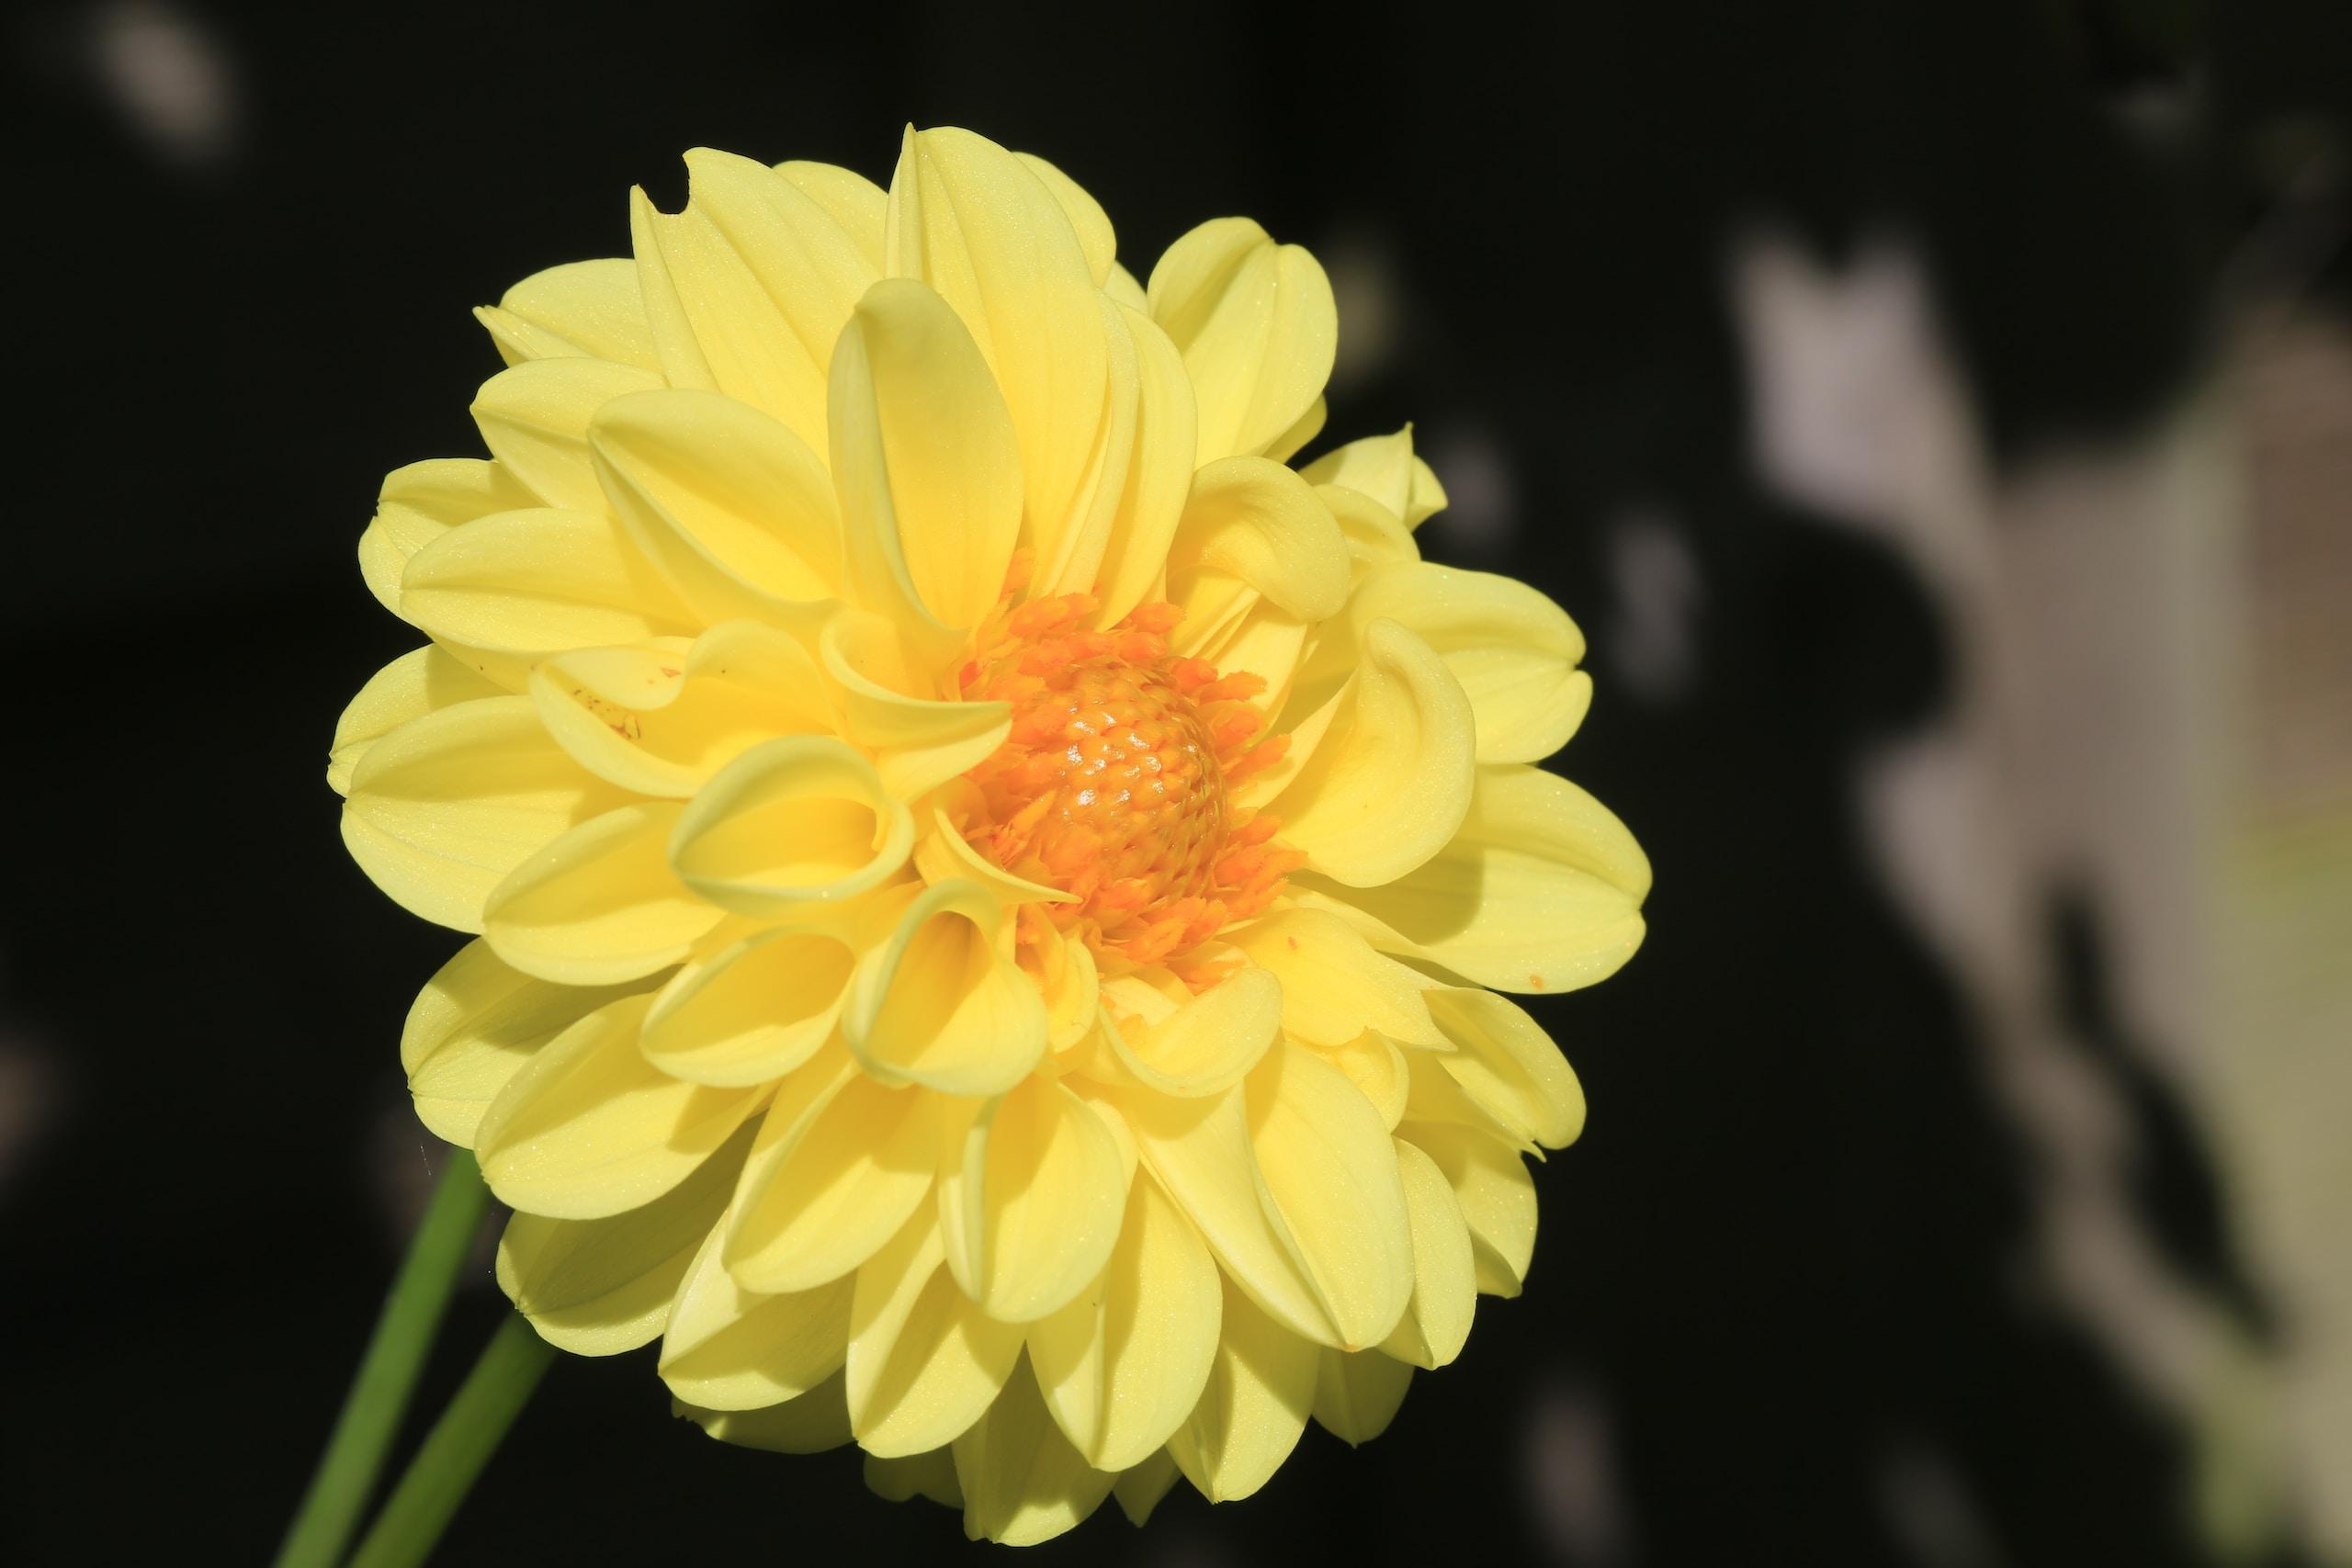 yellow flower in black background